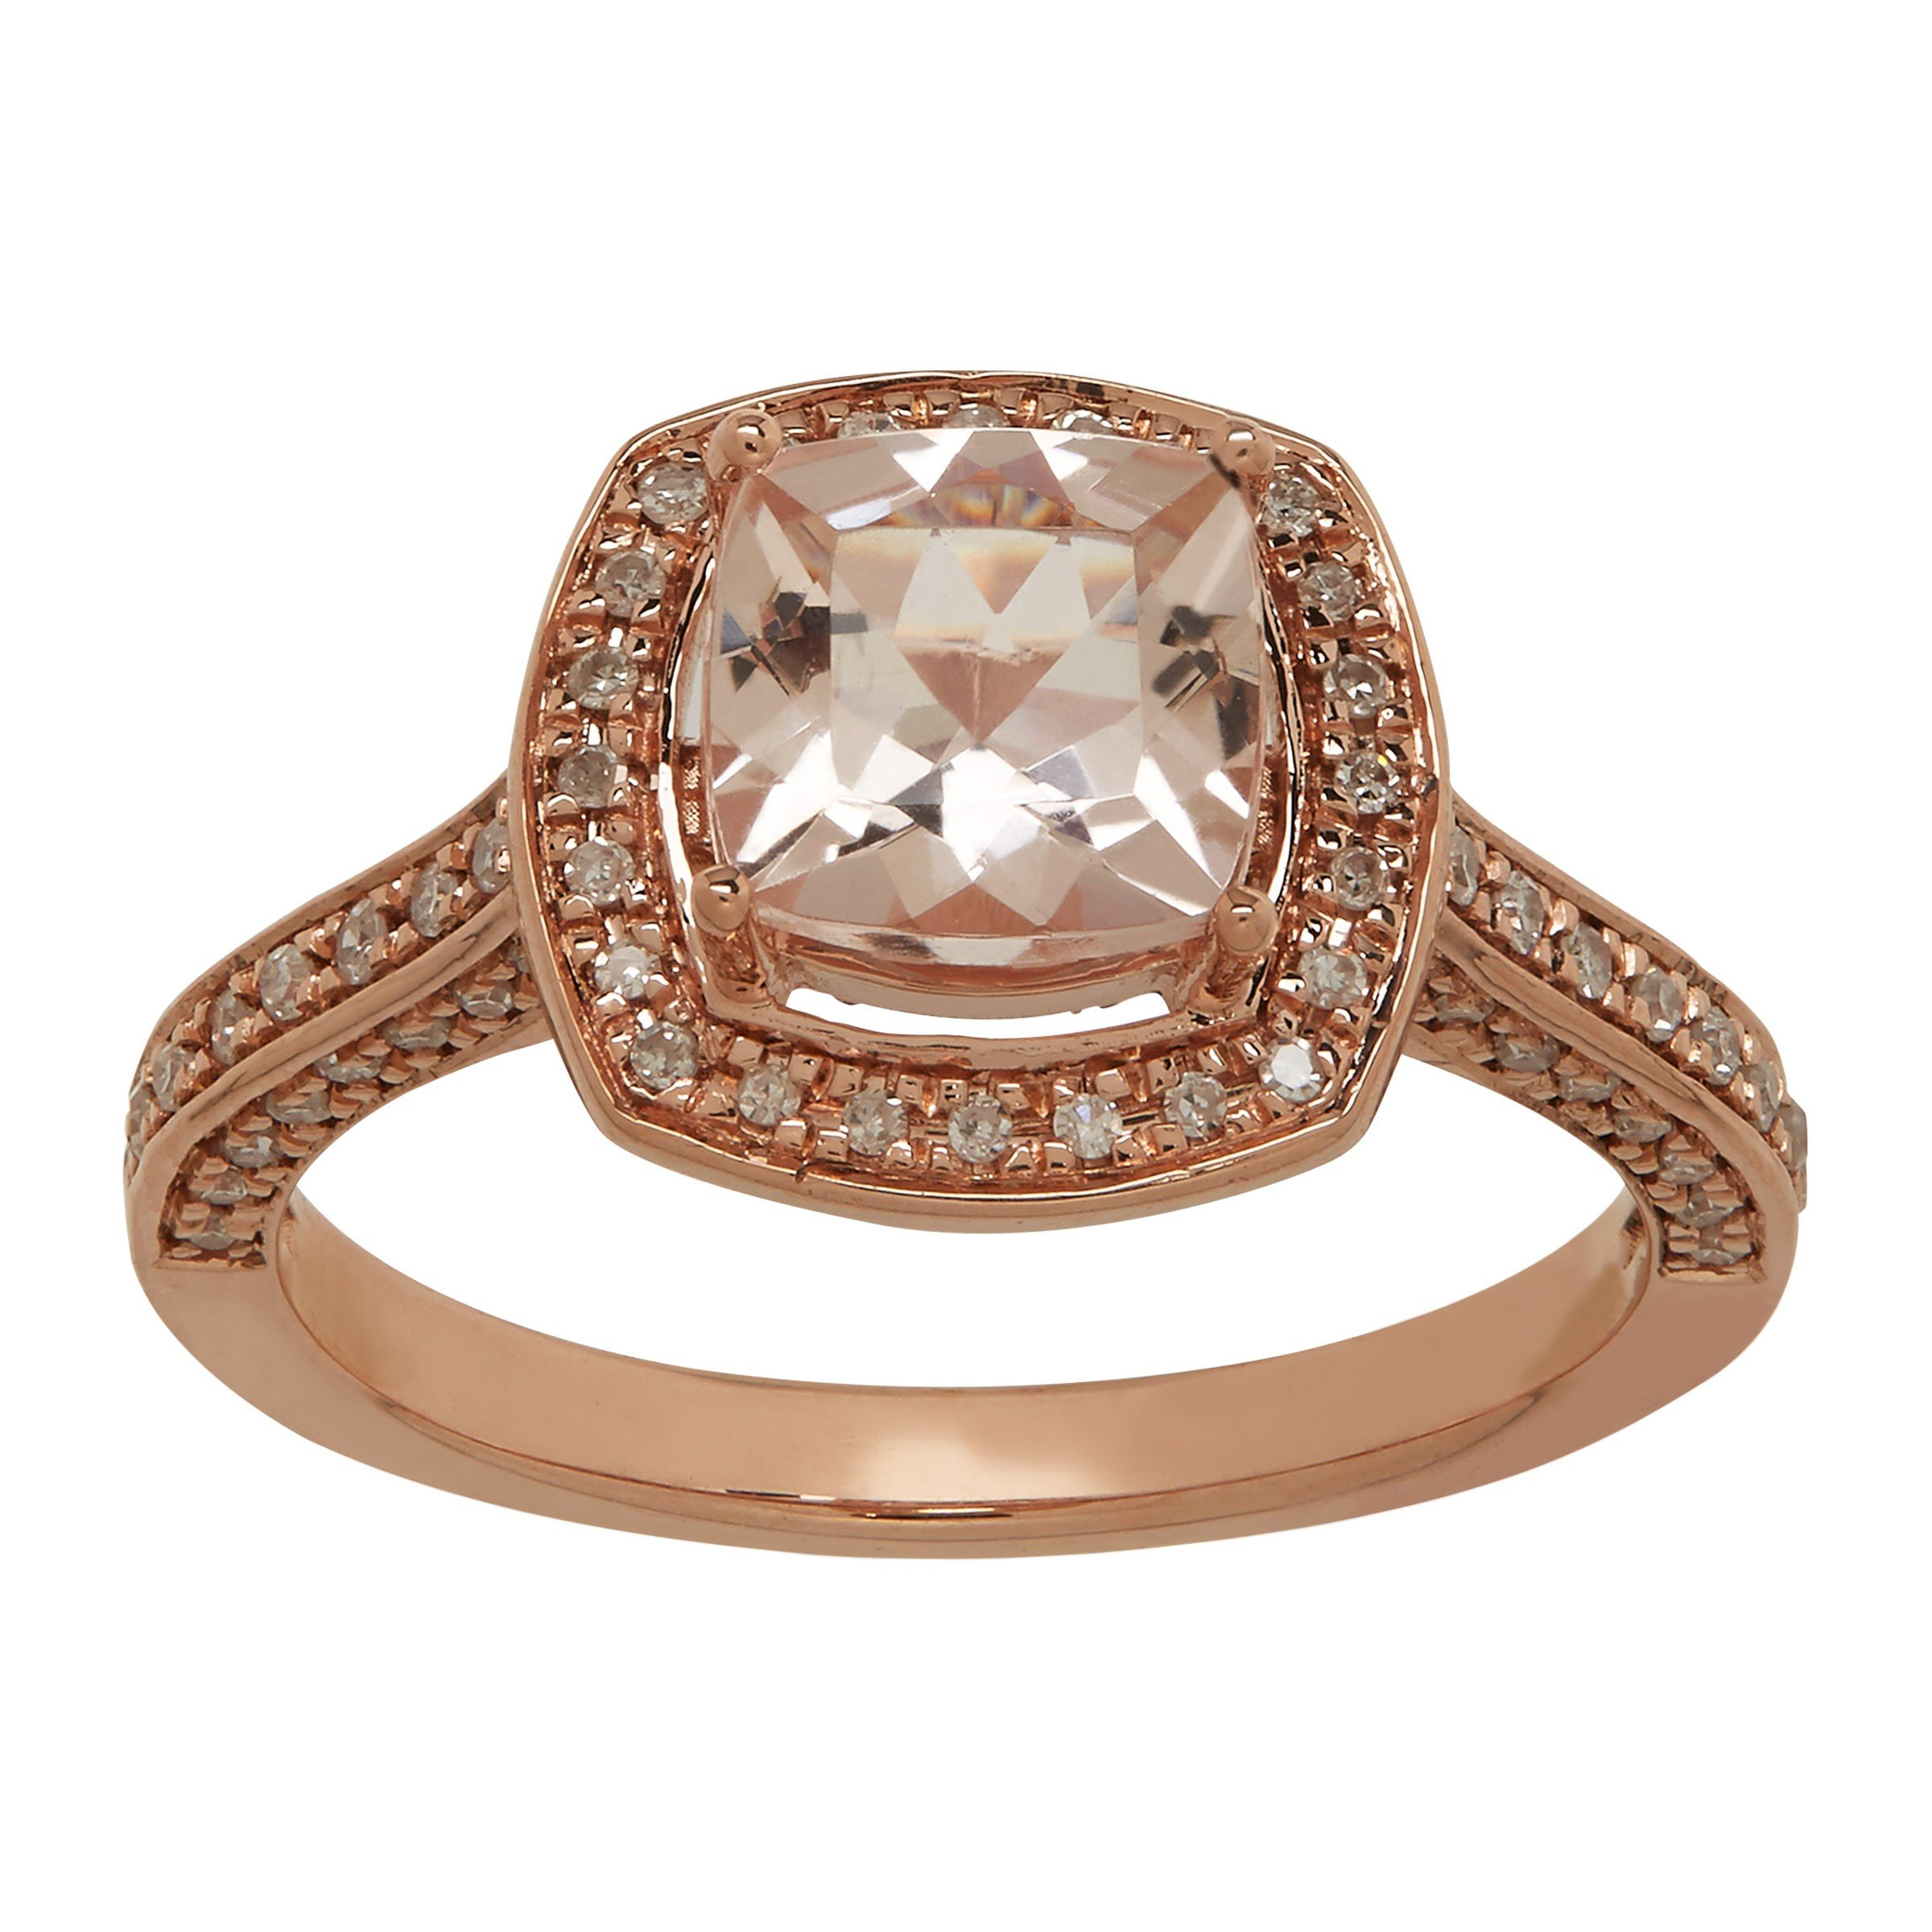 1 1/2 Natural Morganite & 1/4 ct Diamond Ring in 14K Rose Gold Size 7